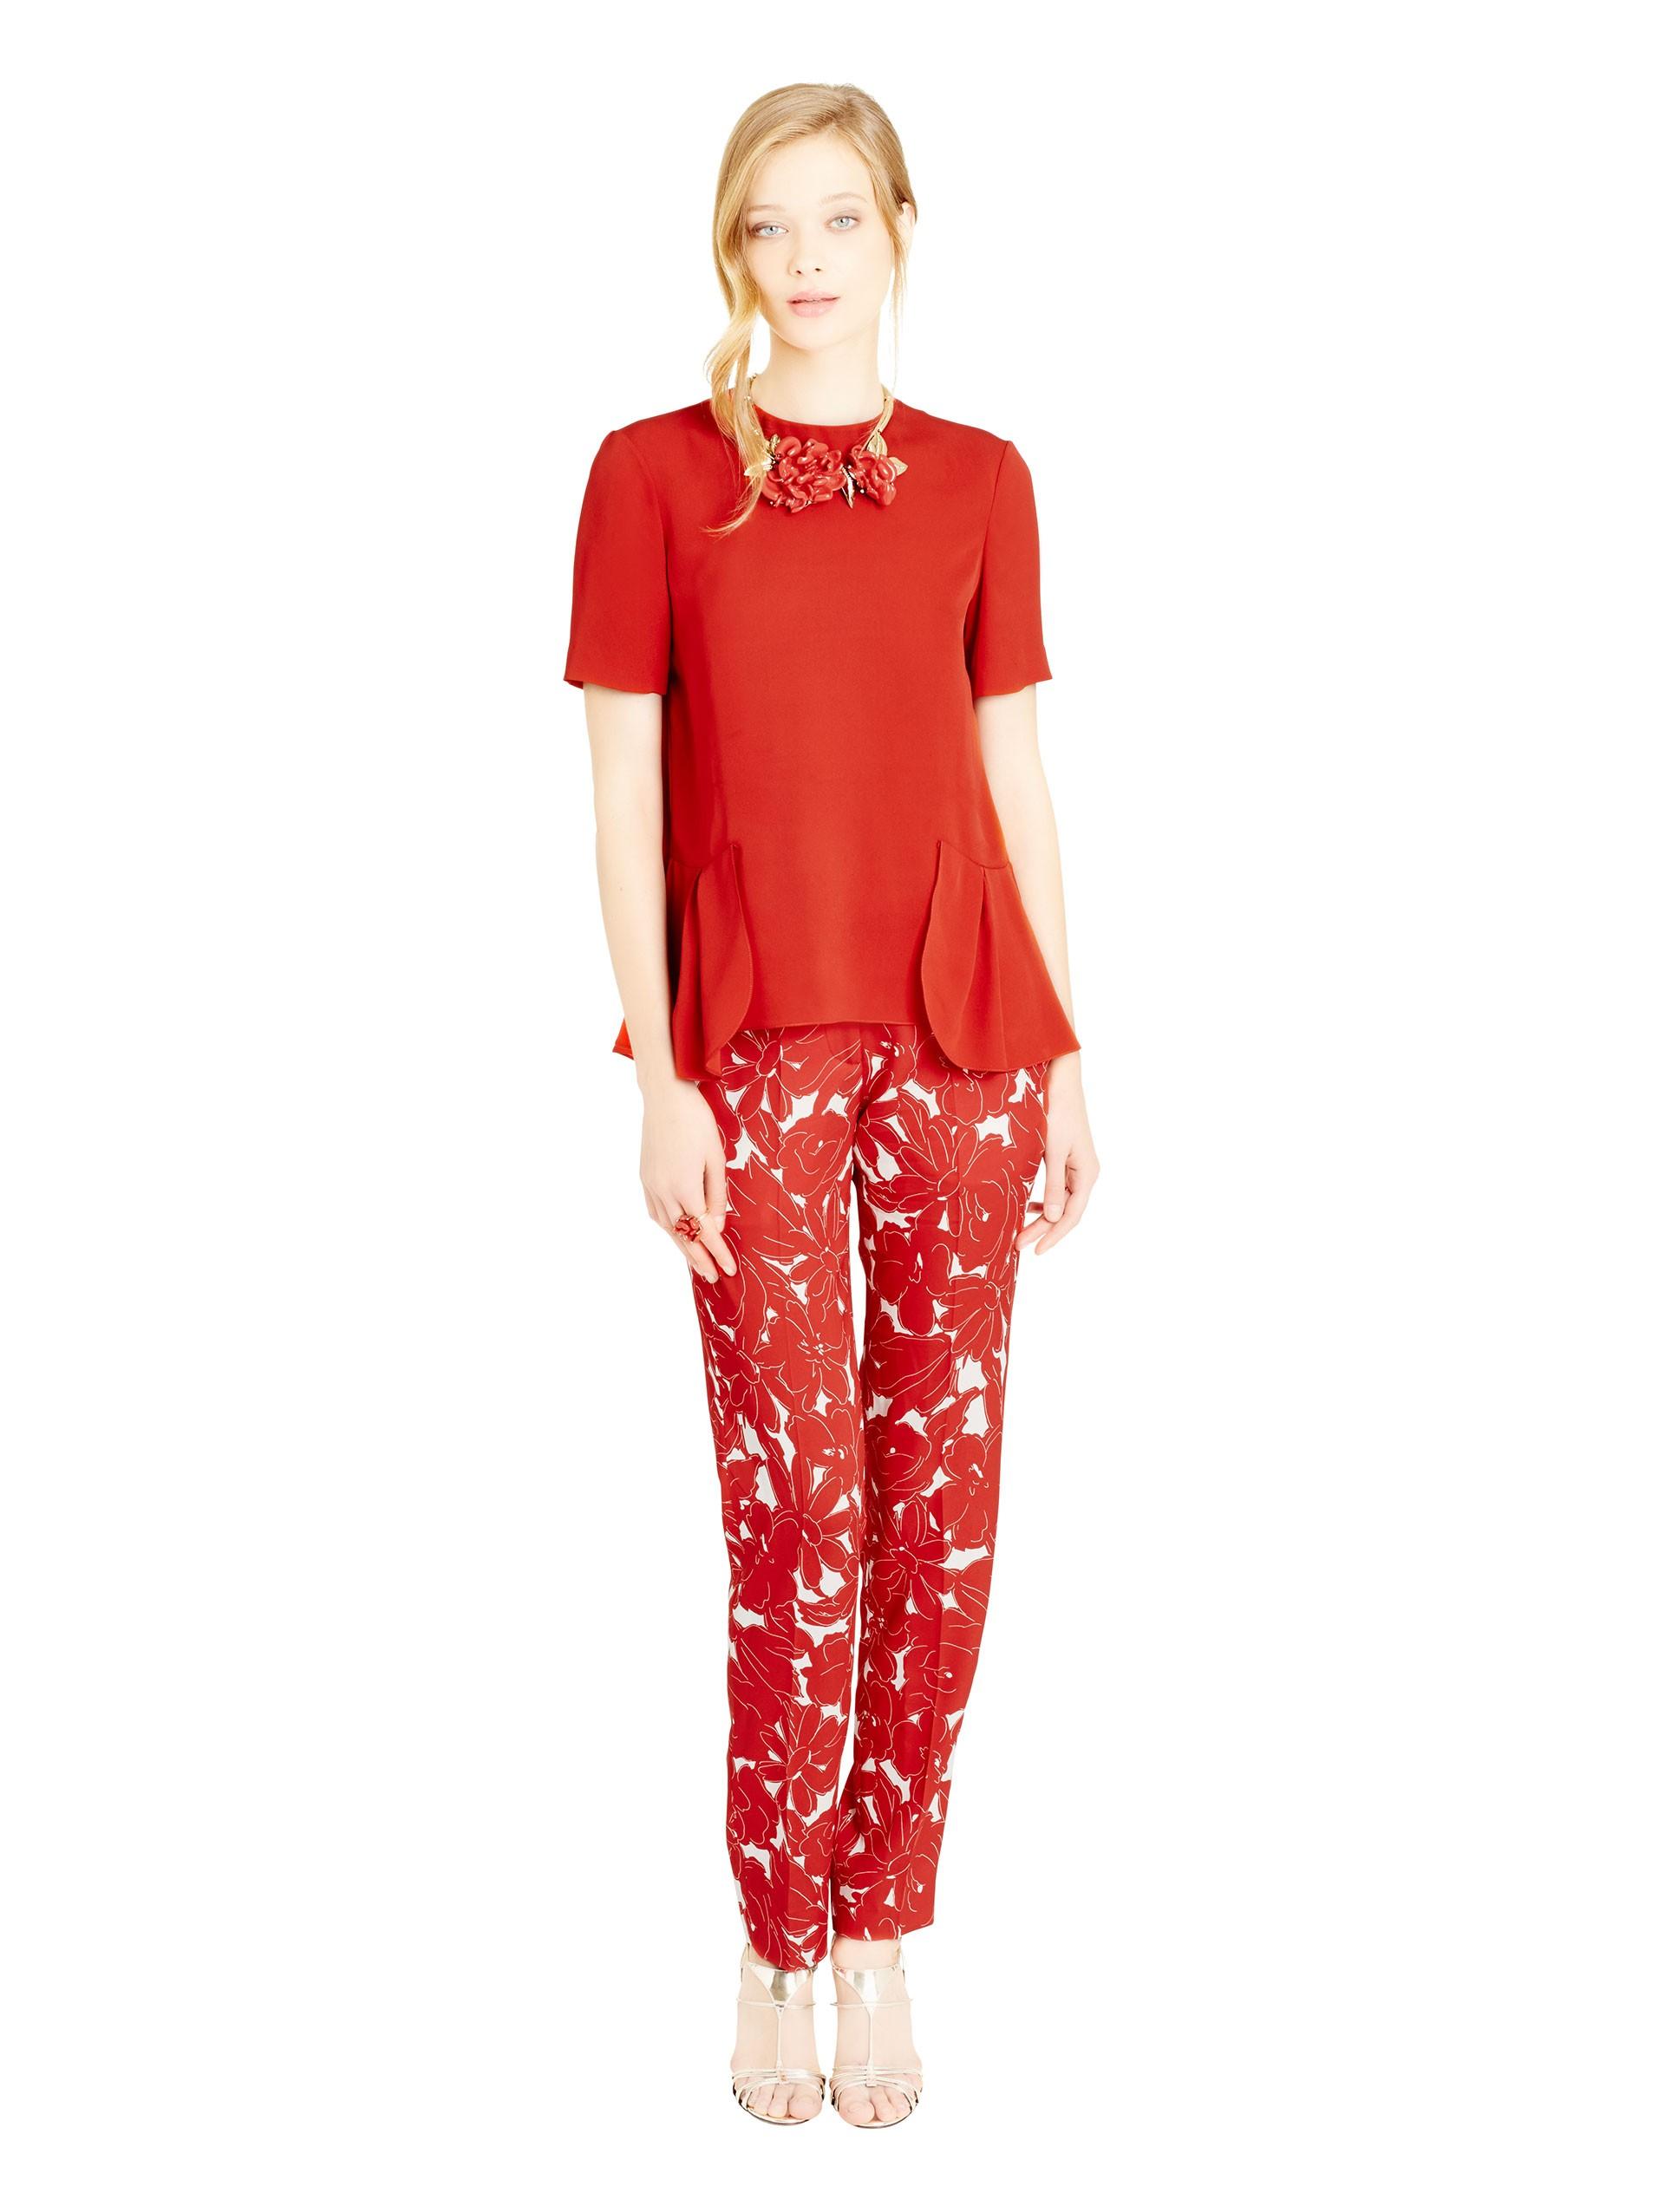 lyst oscar de la renta silk crepe georgette ruffle hem blouse in red. Black Bedroom Furniture Sets. Home Design Ideas